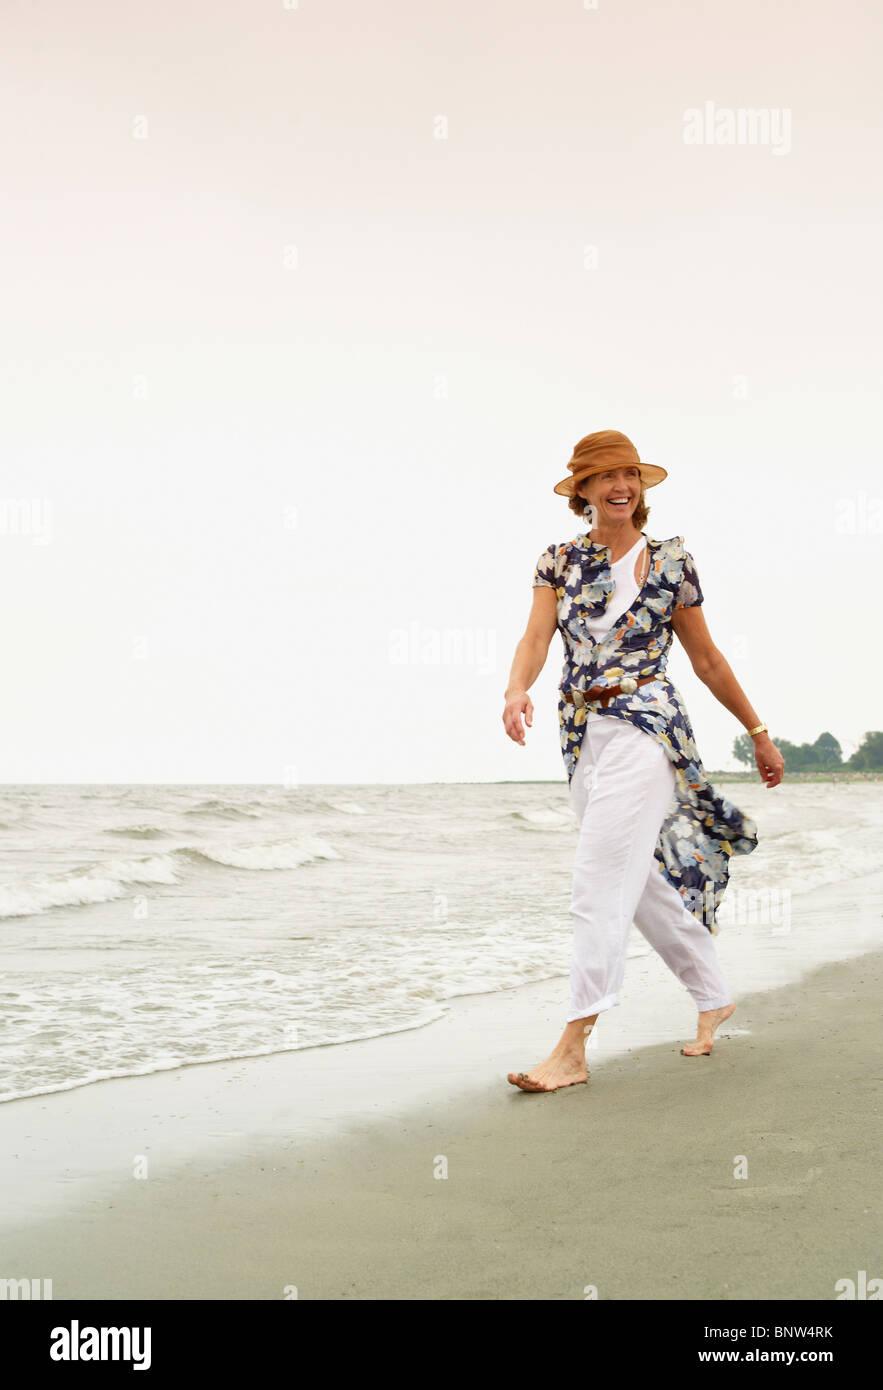 Woman walking on the beach - Stock Image